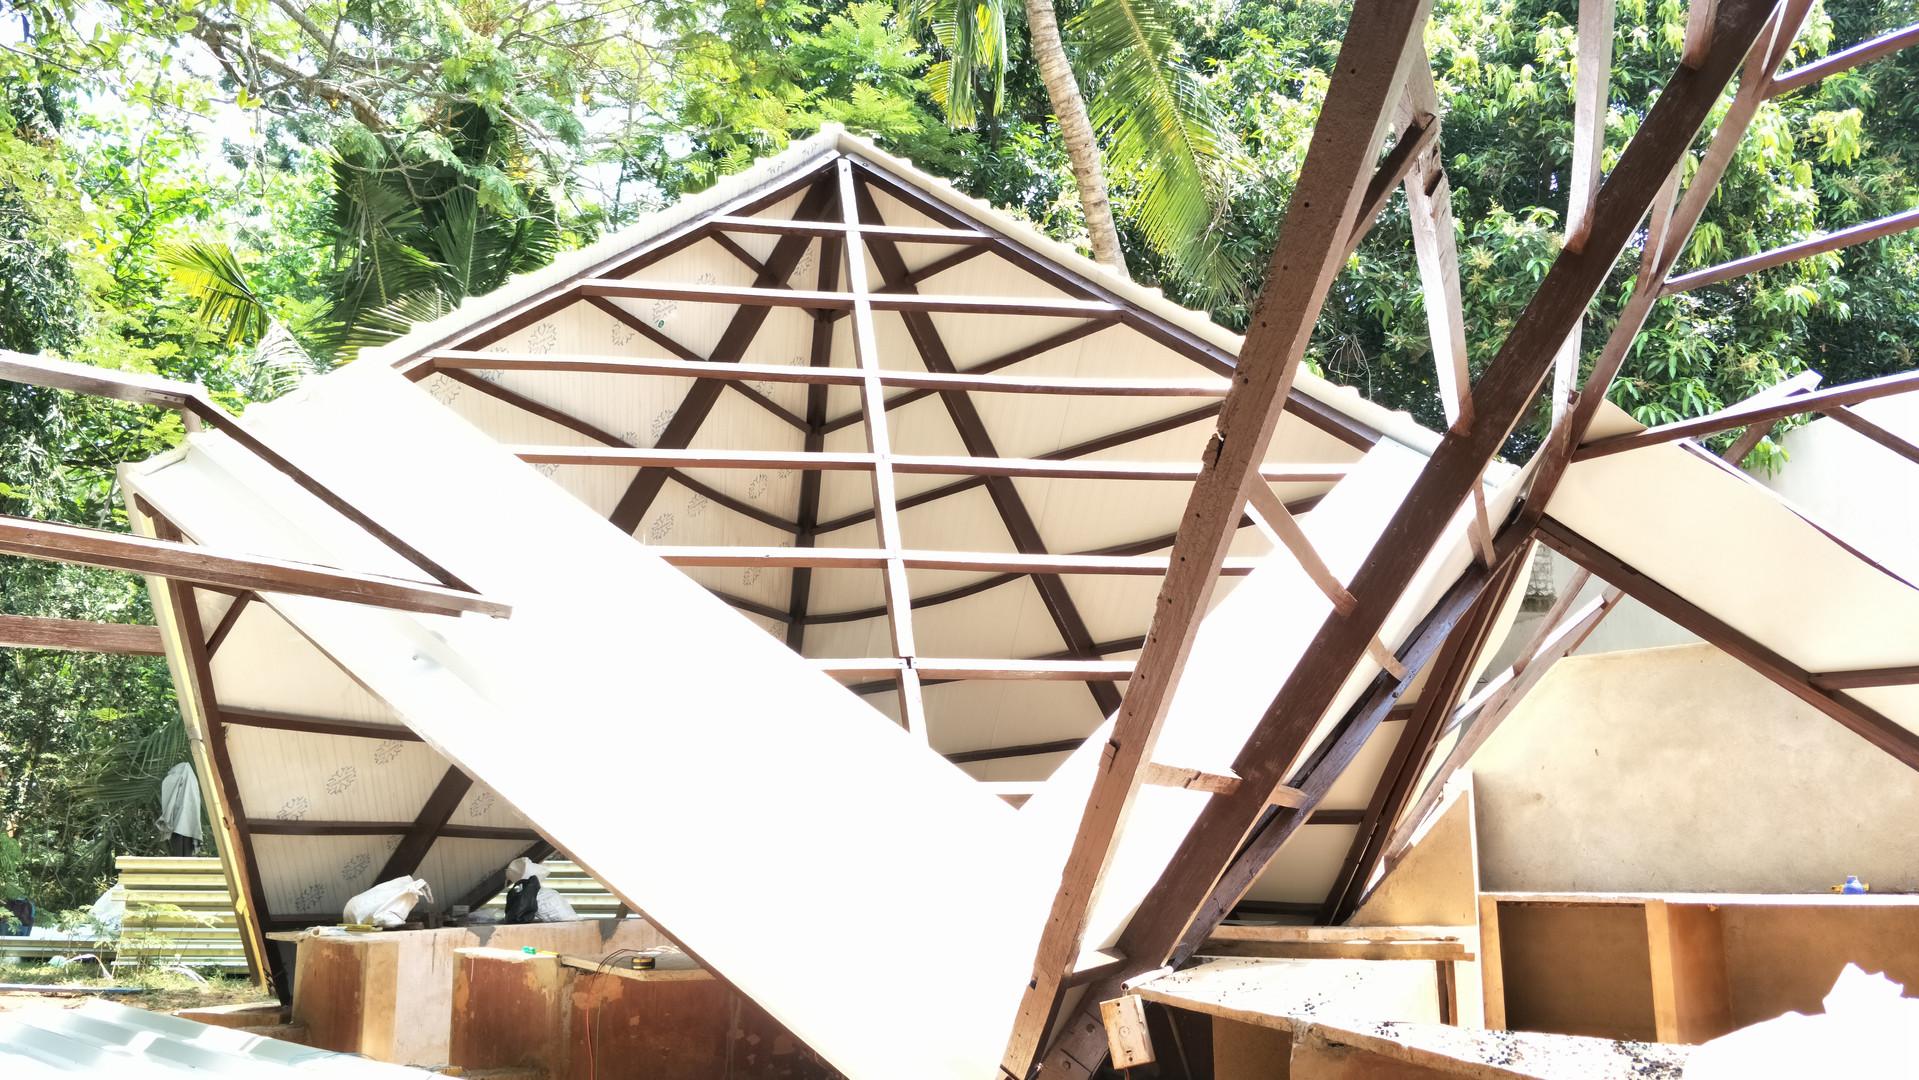 Aspiration Hut Restoration, 2017